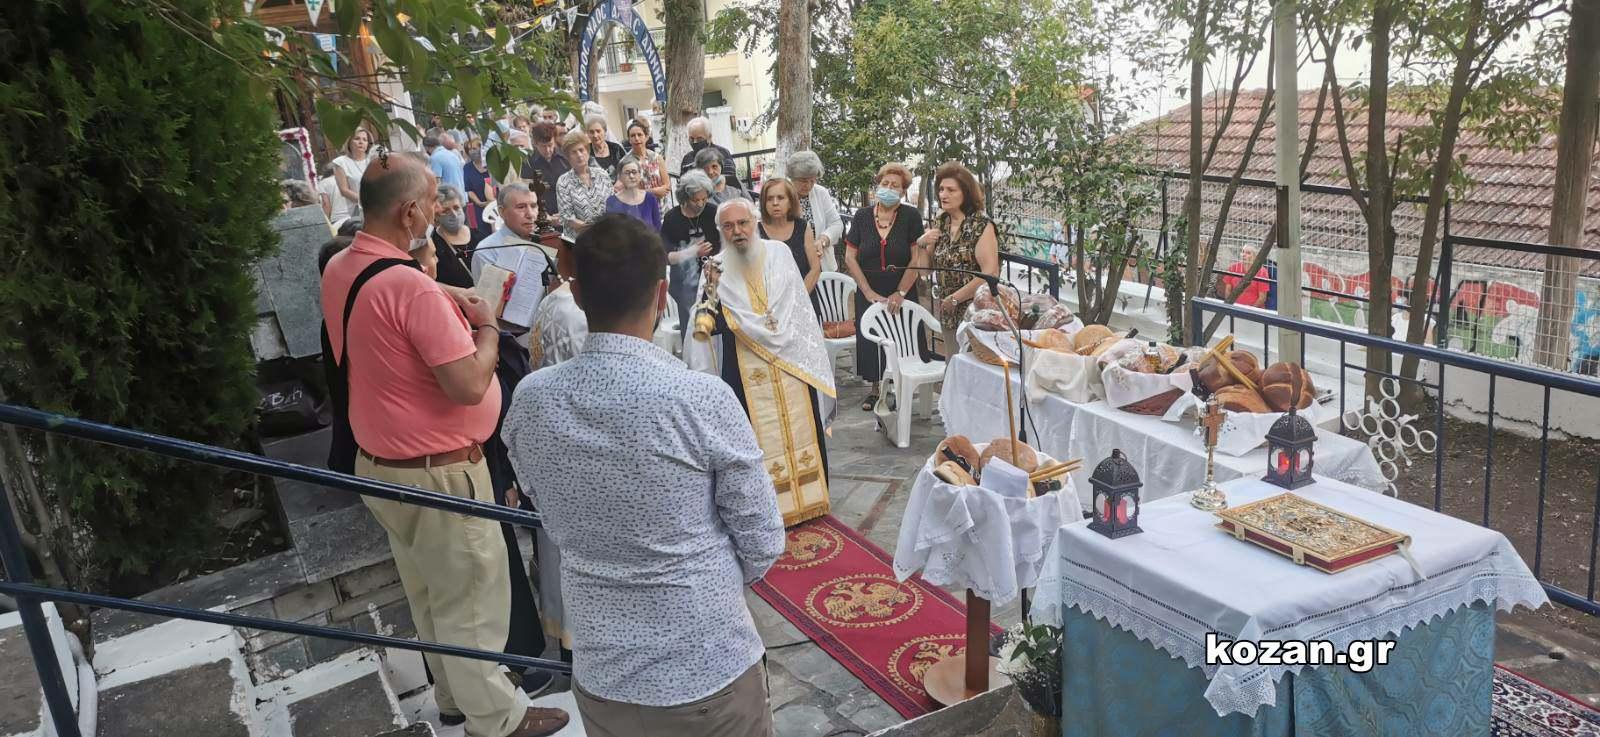 kozan.gr: Κοζάνη: Πανηγυρίζει το Ιερό Εξωκλήσι της Αγίας Άννης – Tελέσθηκε Μέγας Πανηγυρικός Εσπερινός (Φωτογραφίες & Βίντεο)